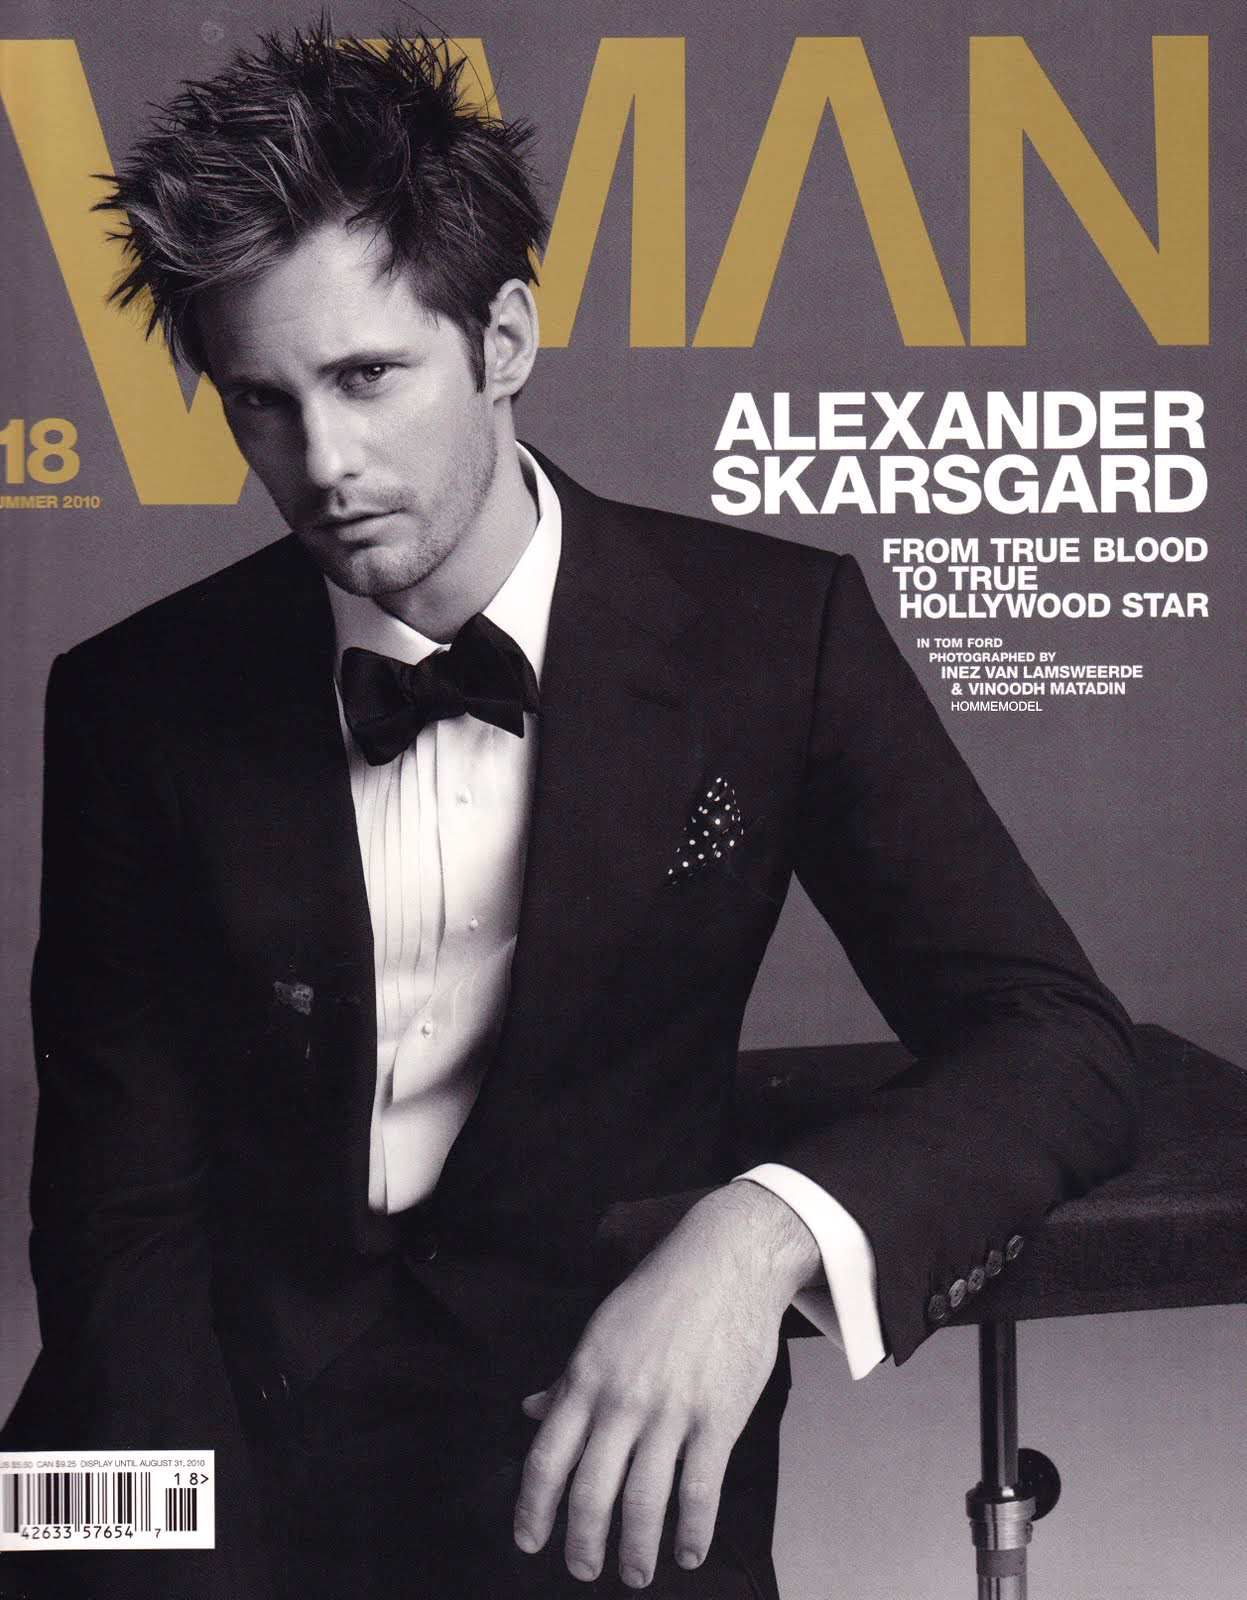 http://3.bp.blogspot.com/_eg2I5vDRaWM/S-Fnr0PM0fI/AAAAAAAALCY/AM2TCtFBi6I/s1600/VMAN+-+Alexander+Skarsgard+by+Inez+%26+Vinoodh.jpg